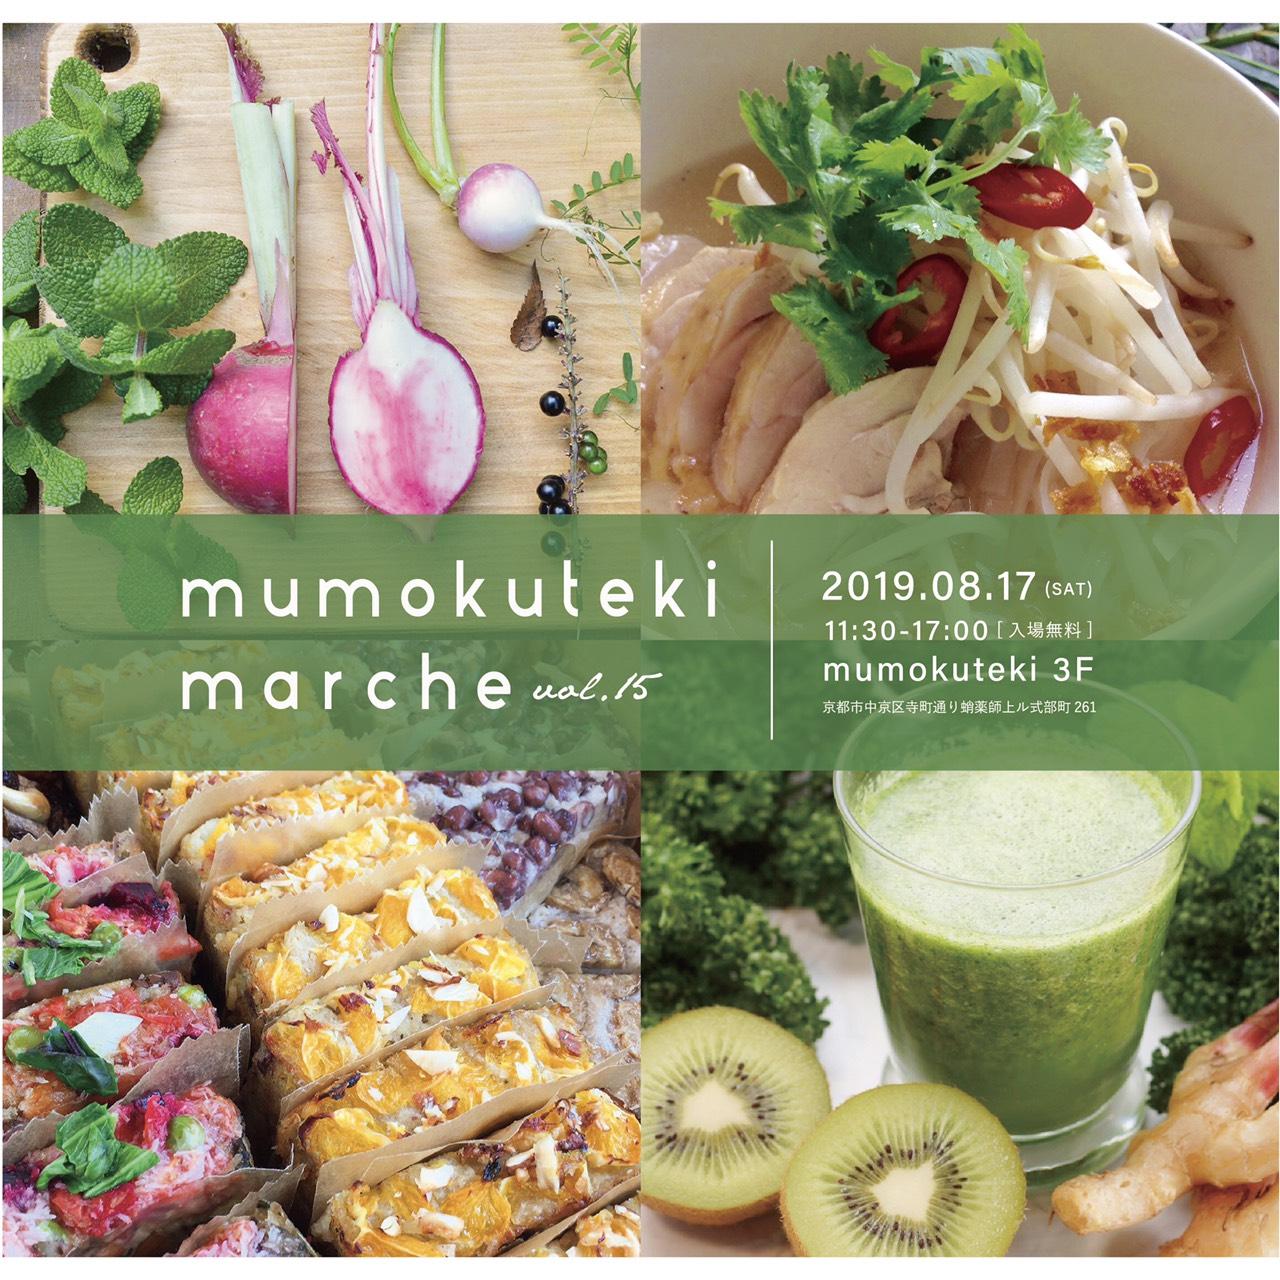 mumokuteki marche vol.15